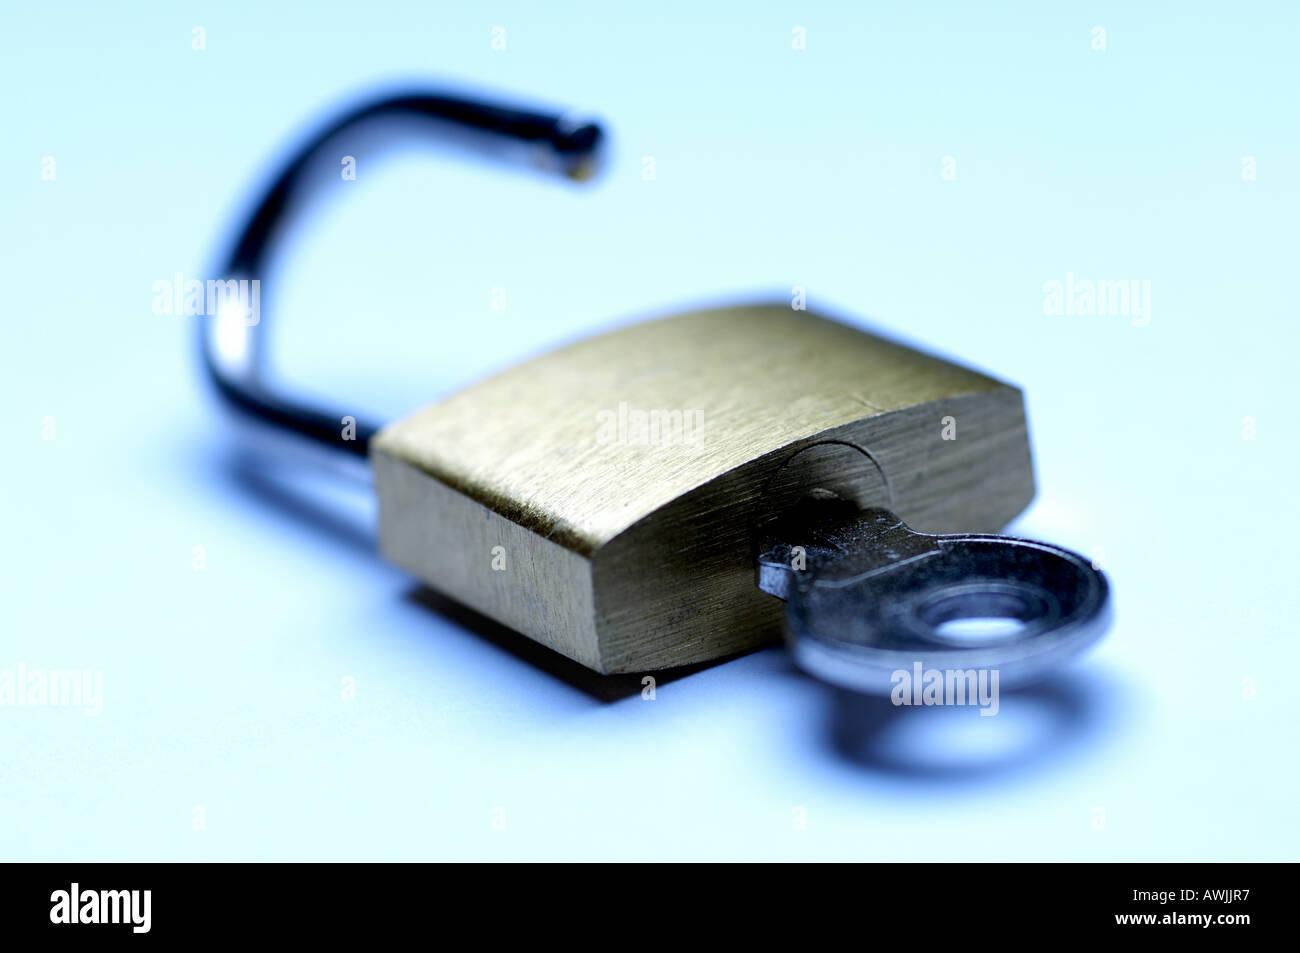 Open padlock and key - Stock Image